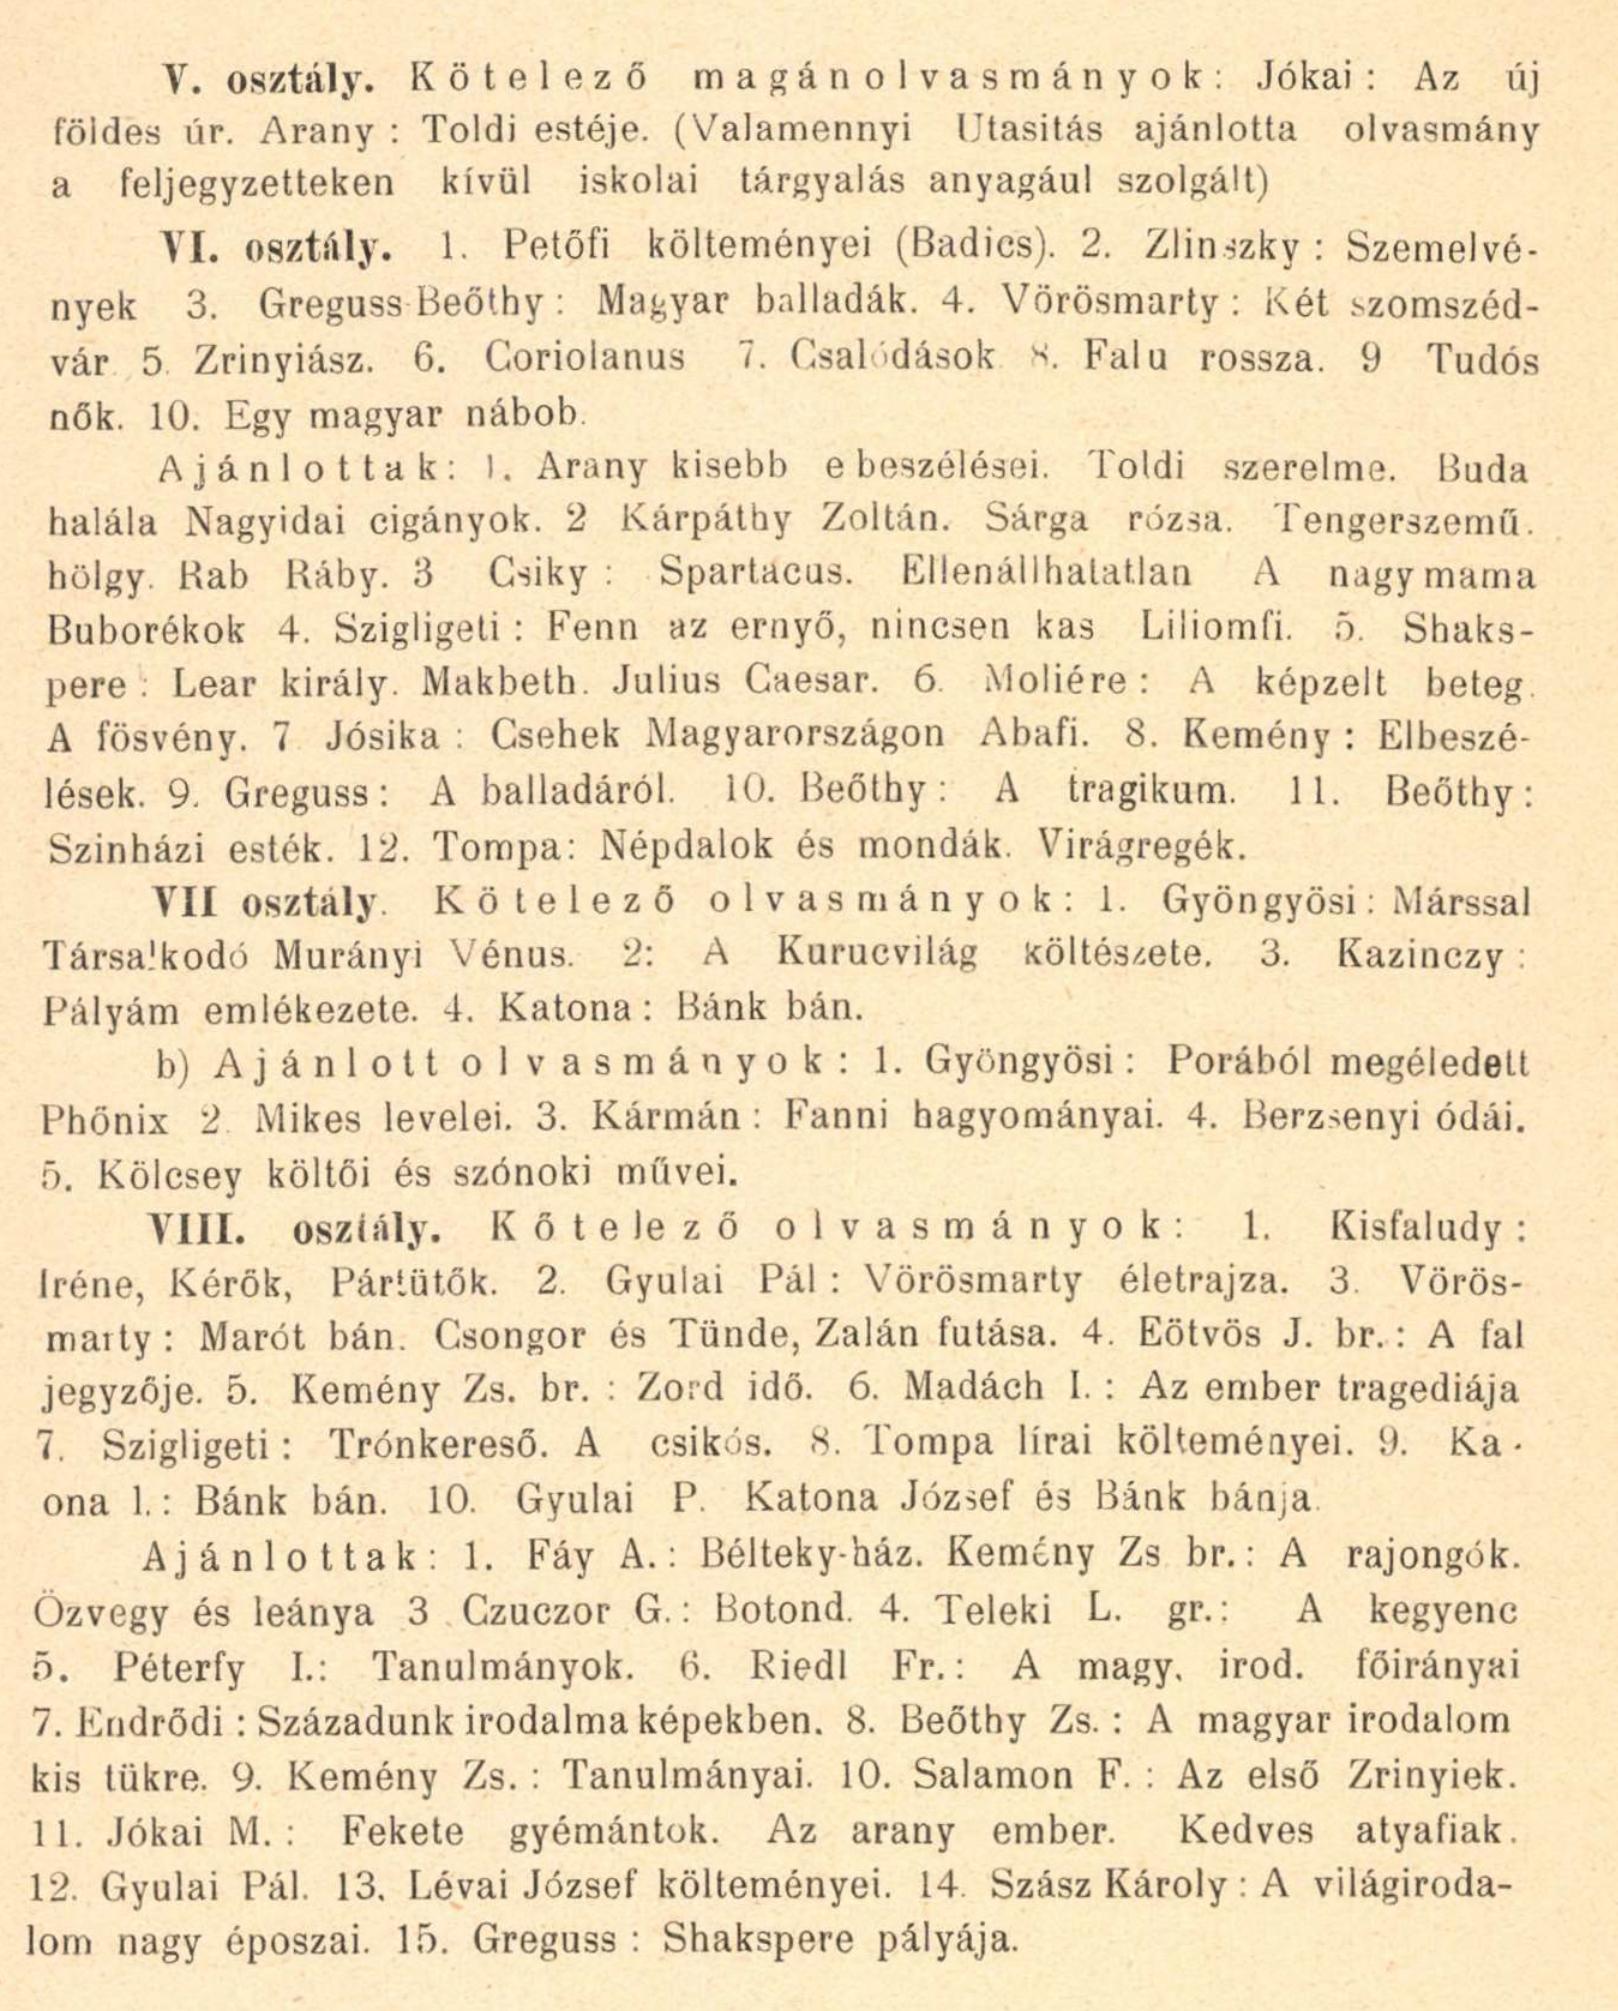 1908-kotelezok.jpg